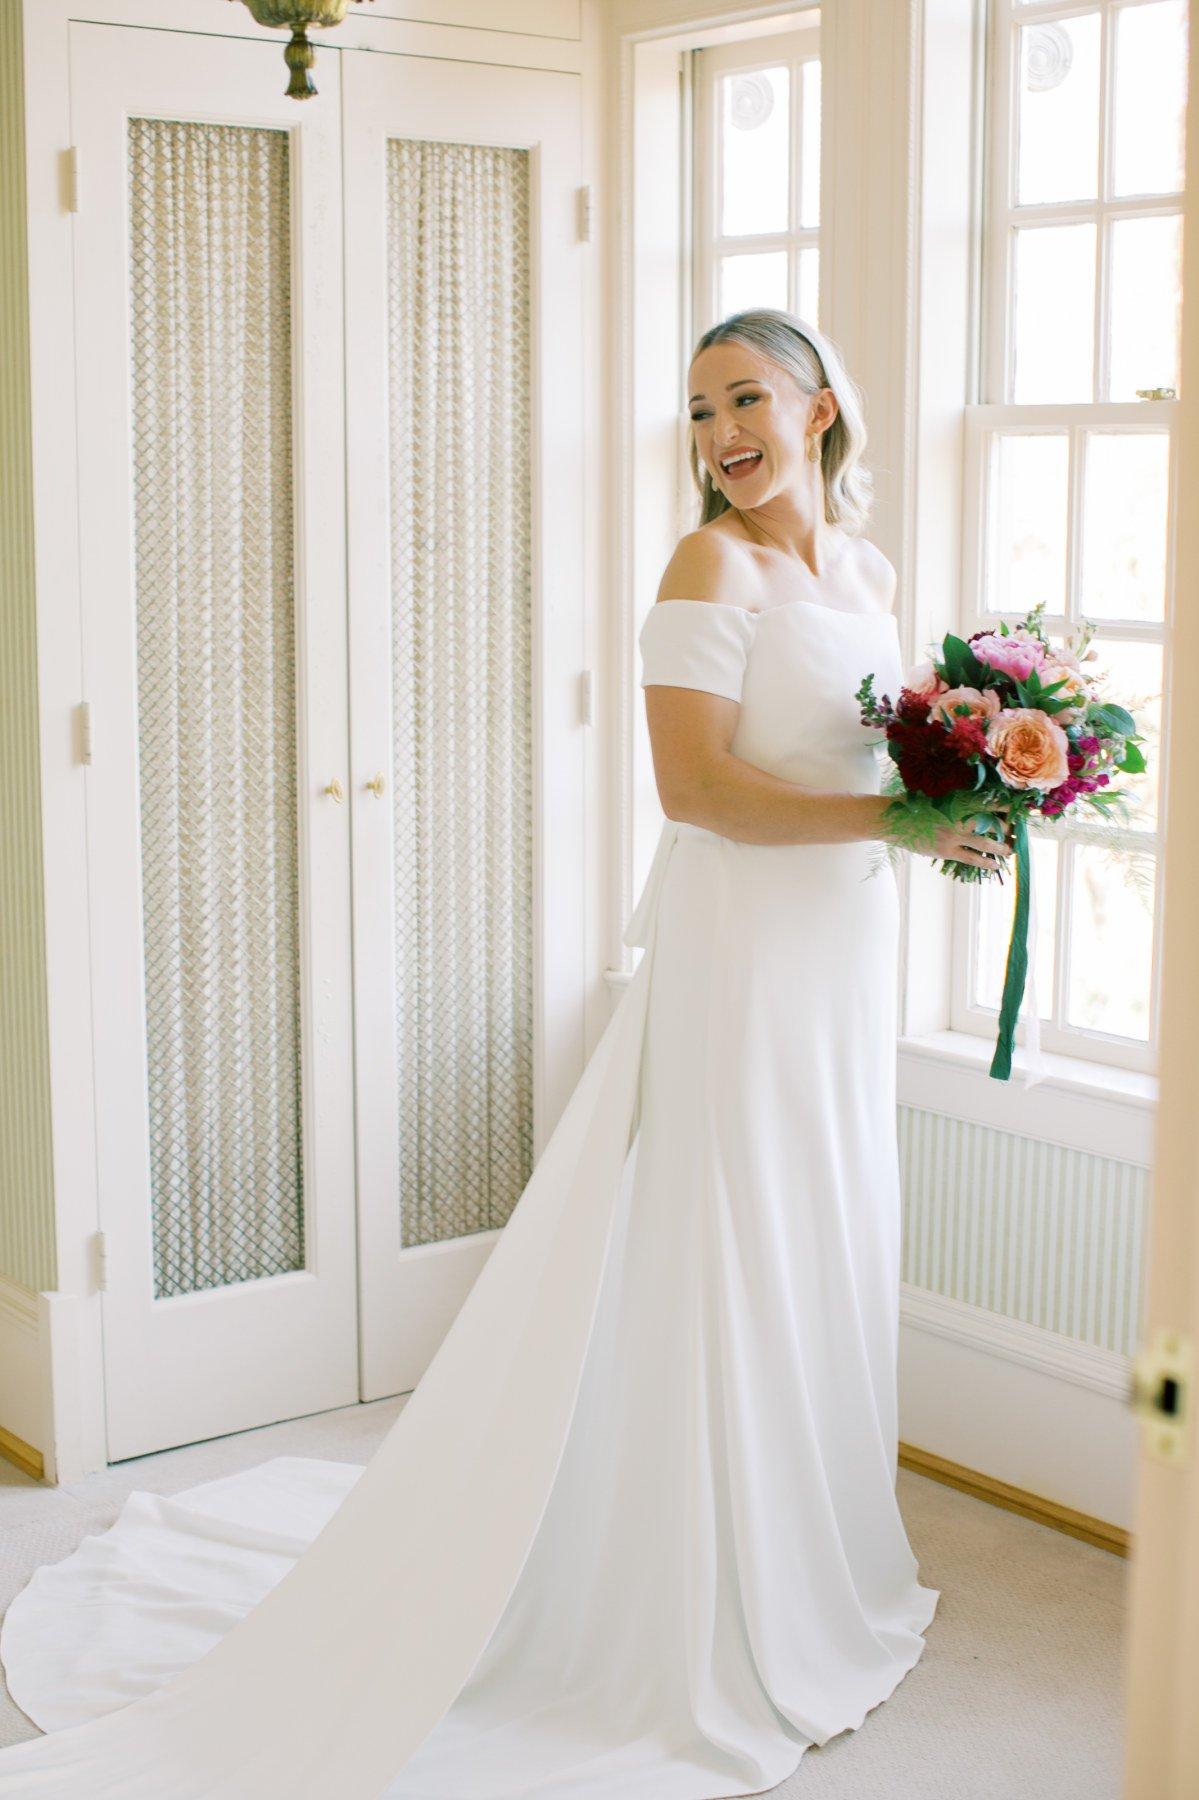 56Great_Marsh_Estate_Jillian_Justin_Wedding_AstridPhotography_AnneKelleyEventsAP_01642